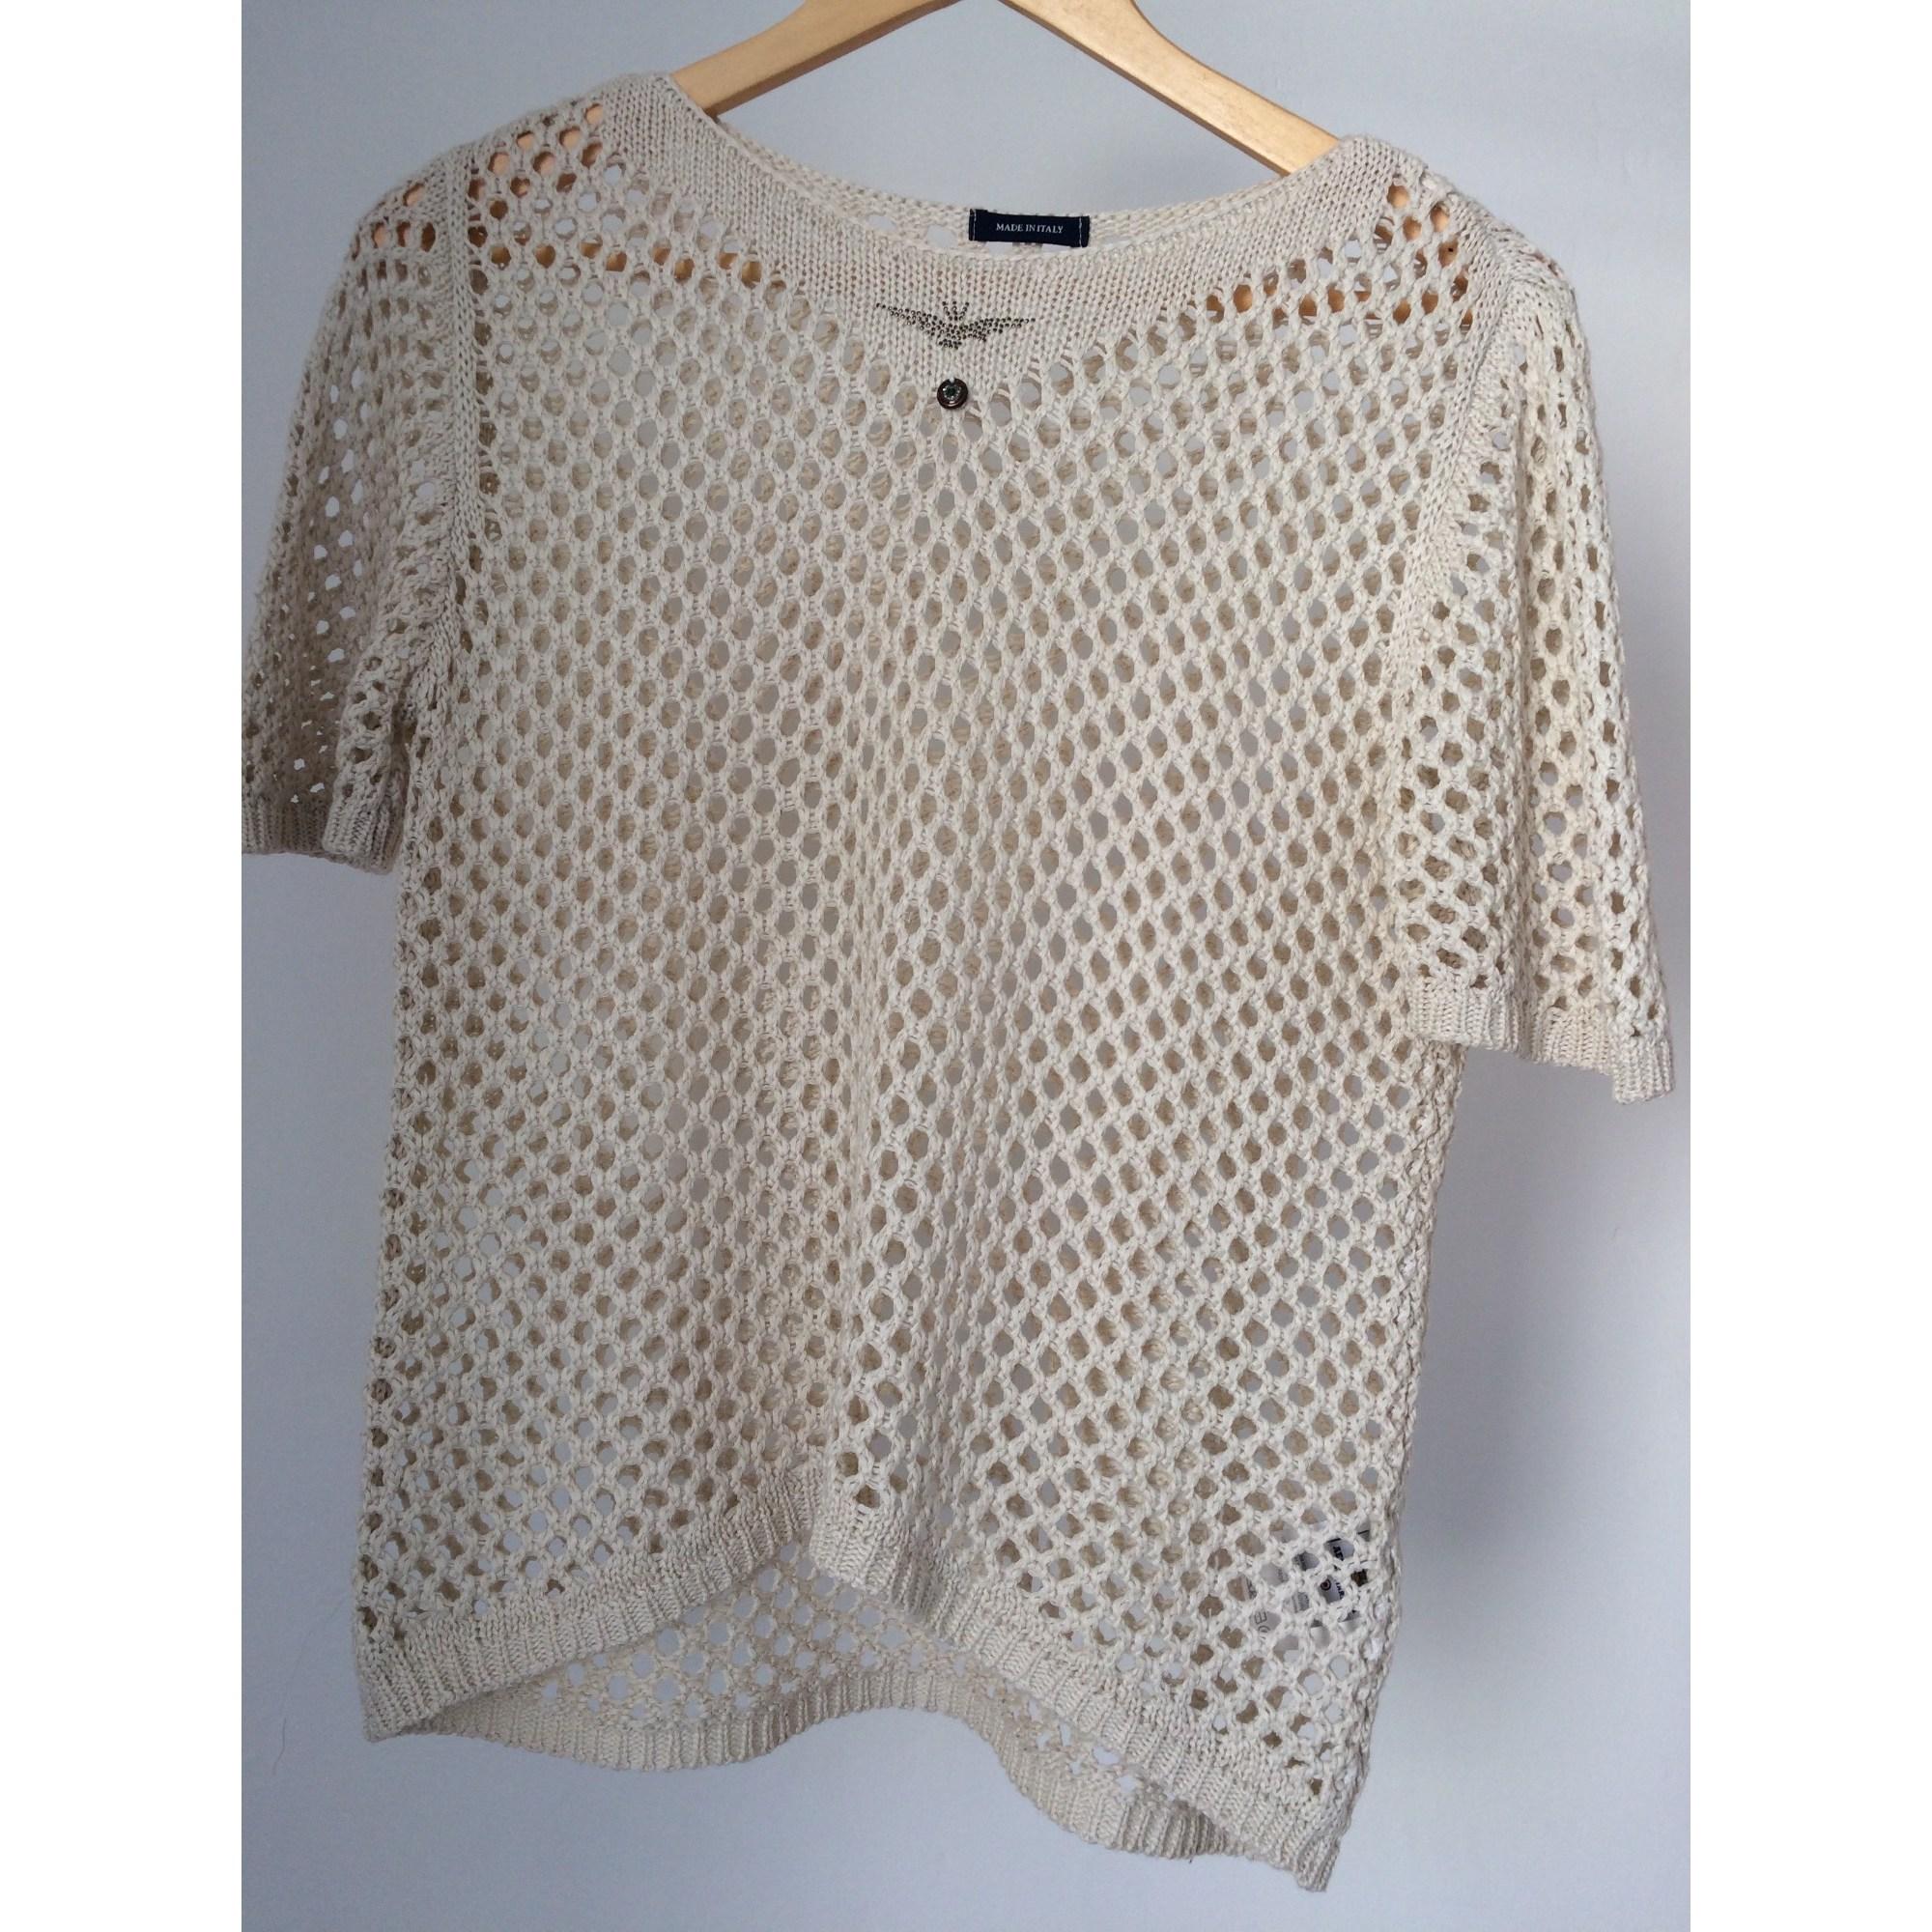 Top, tee-shirt AERONAUTICA MILITARE Beige, camel